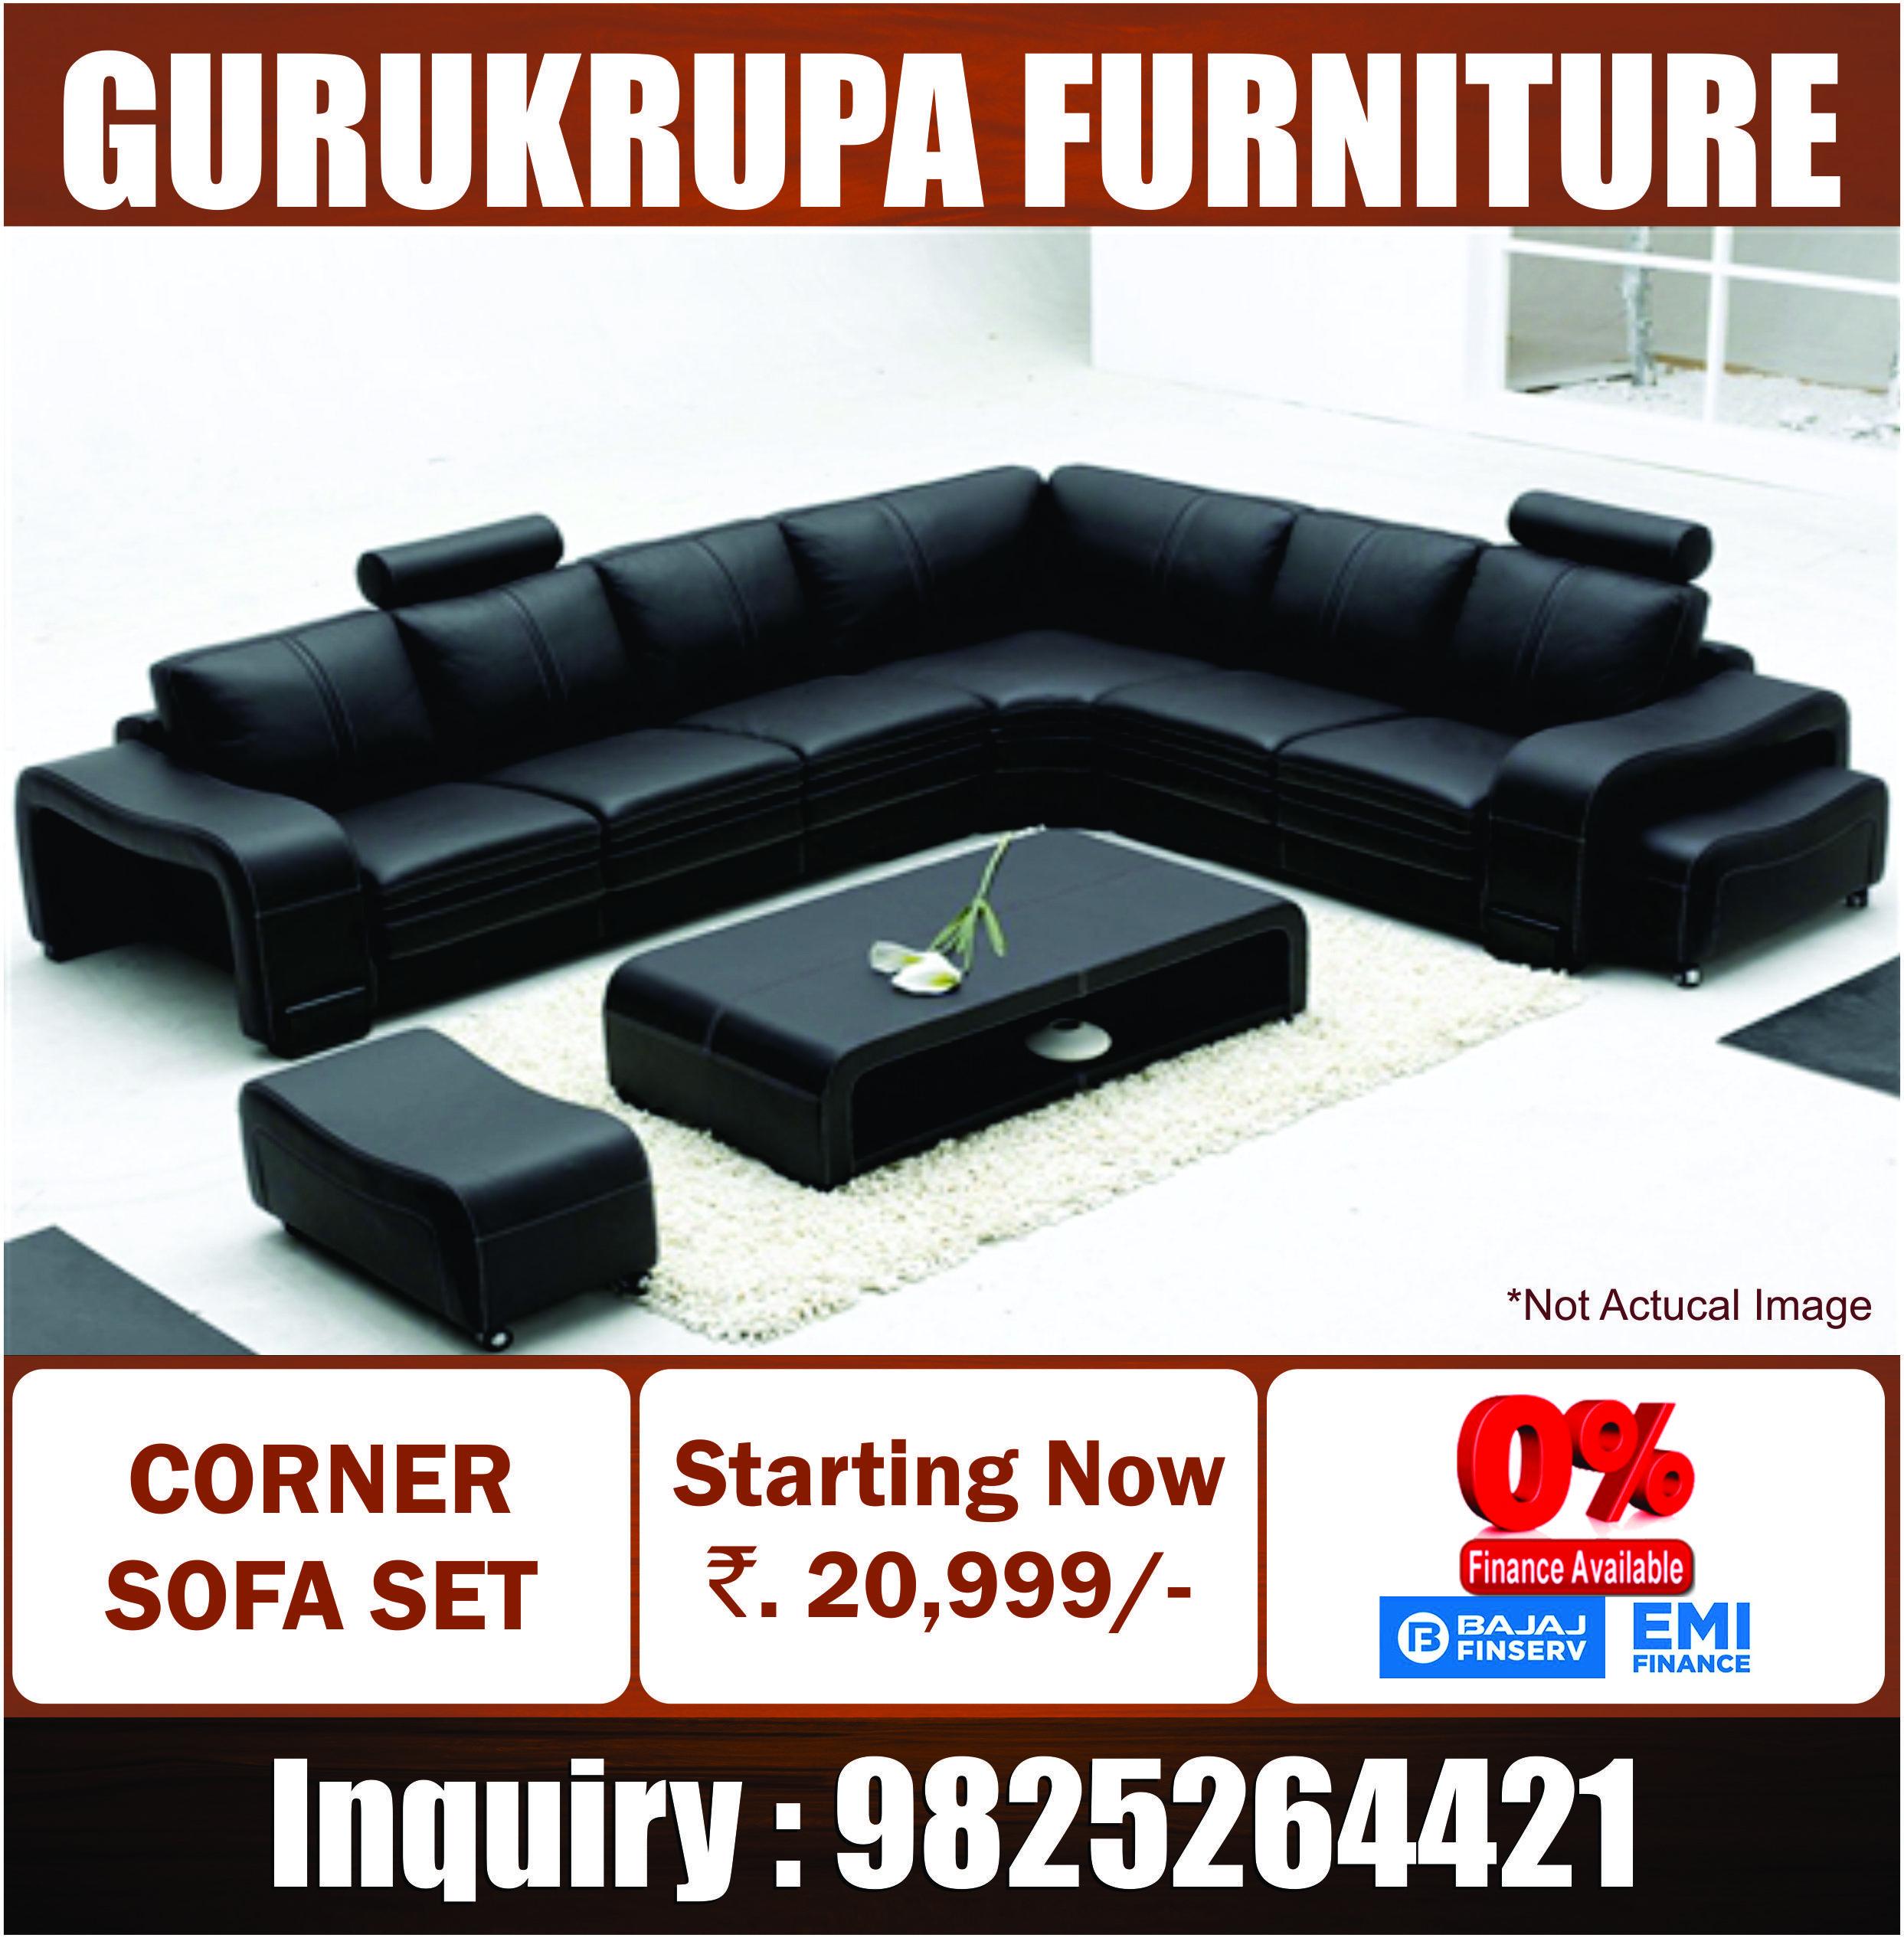 Cornersofa Gurukrupaahd Inquiry 9825264421 Corner Sofa Sofa Set Furniture Manufacturers